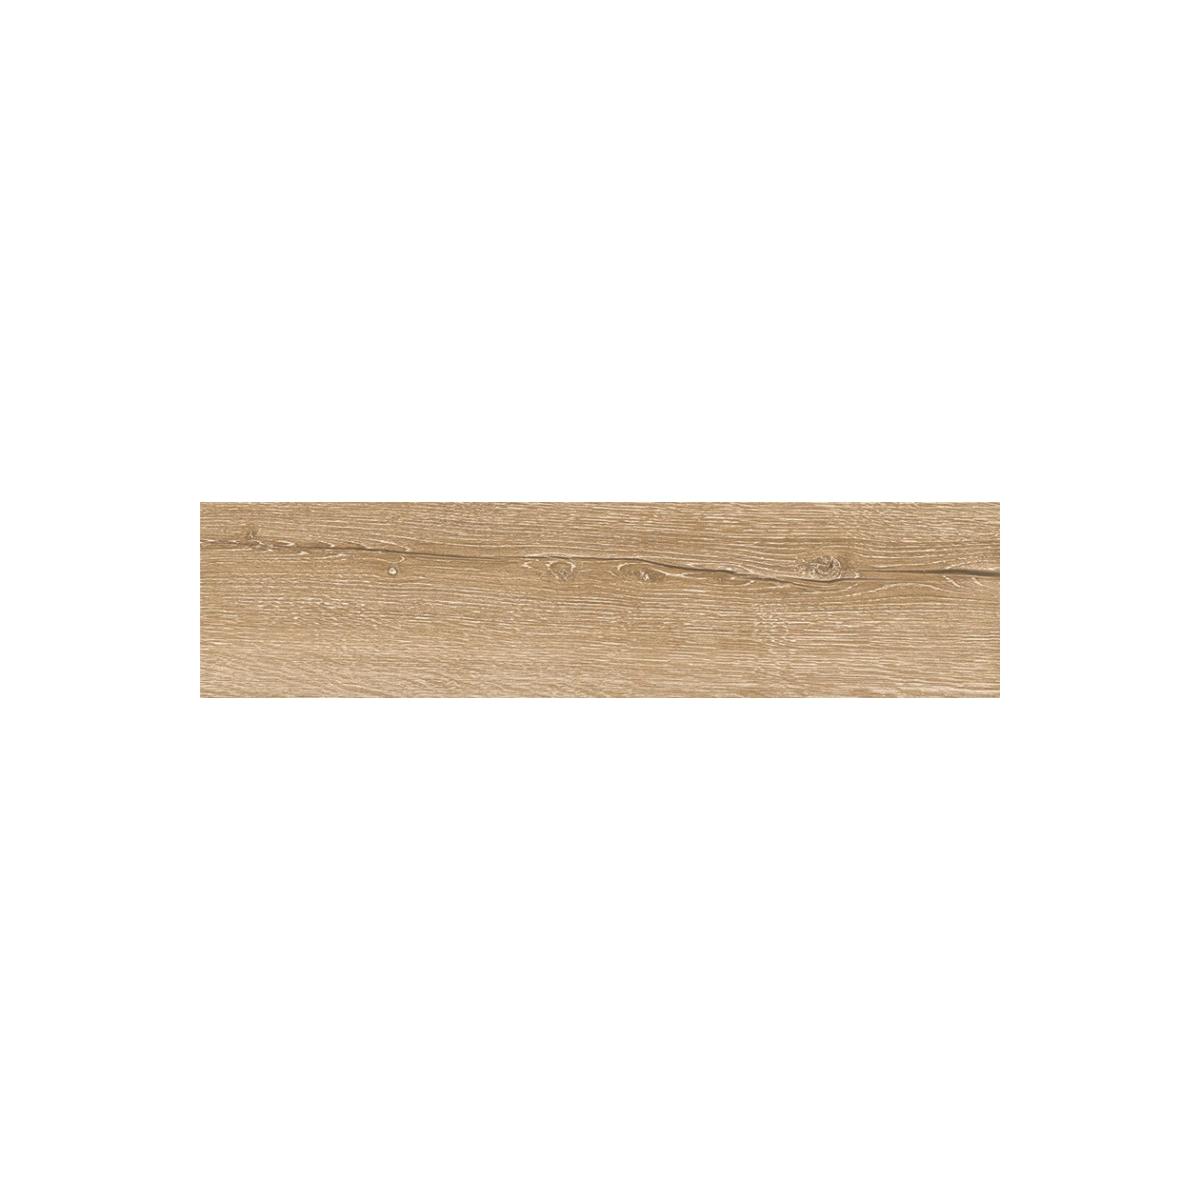 Textura borde de piscina Yoho Oak 45x75x3